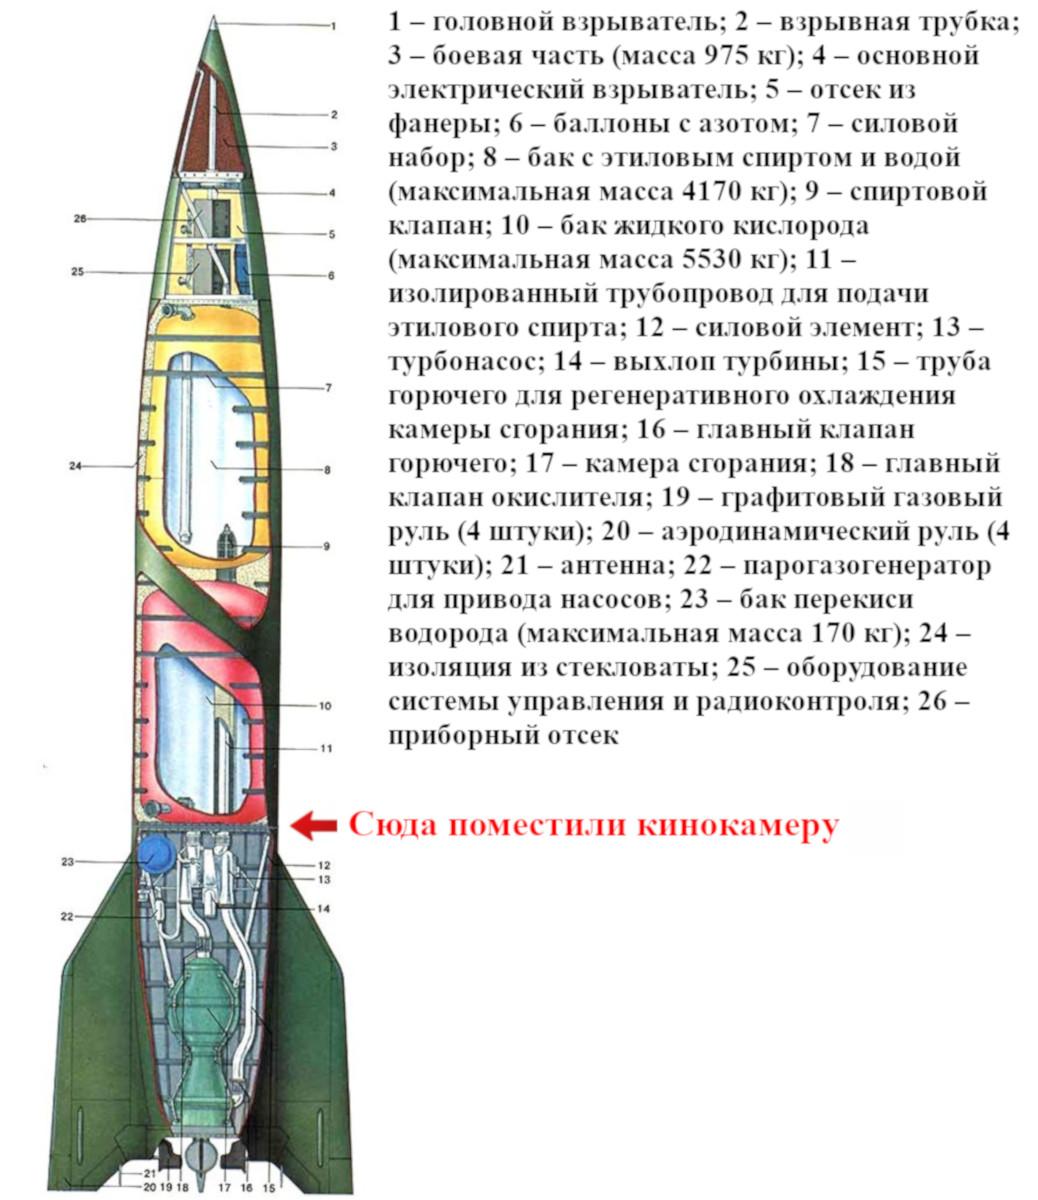 Устройство ракеты «Фау-2»